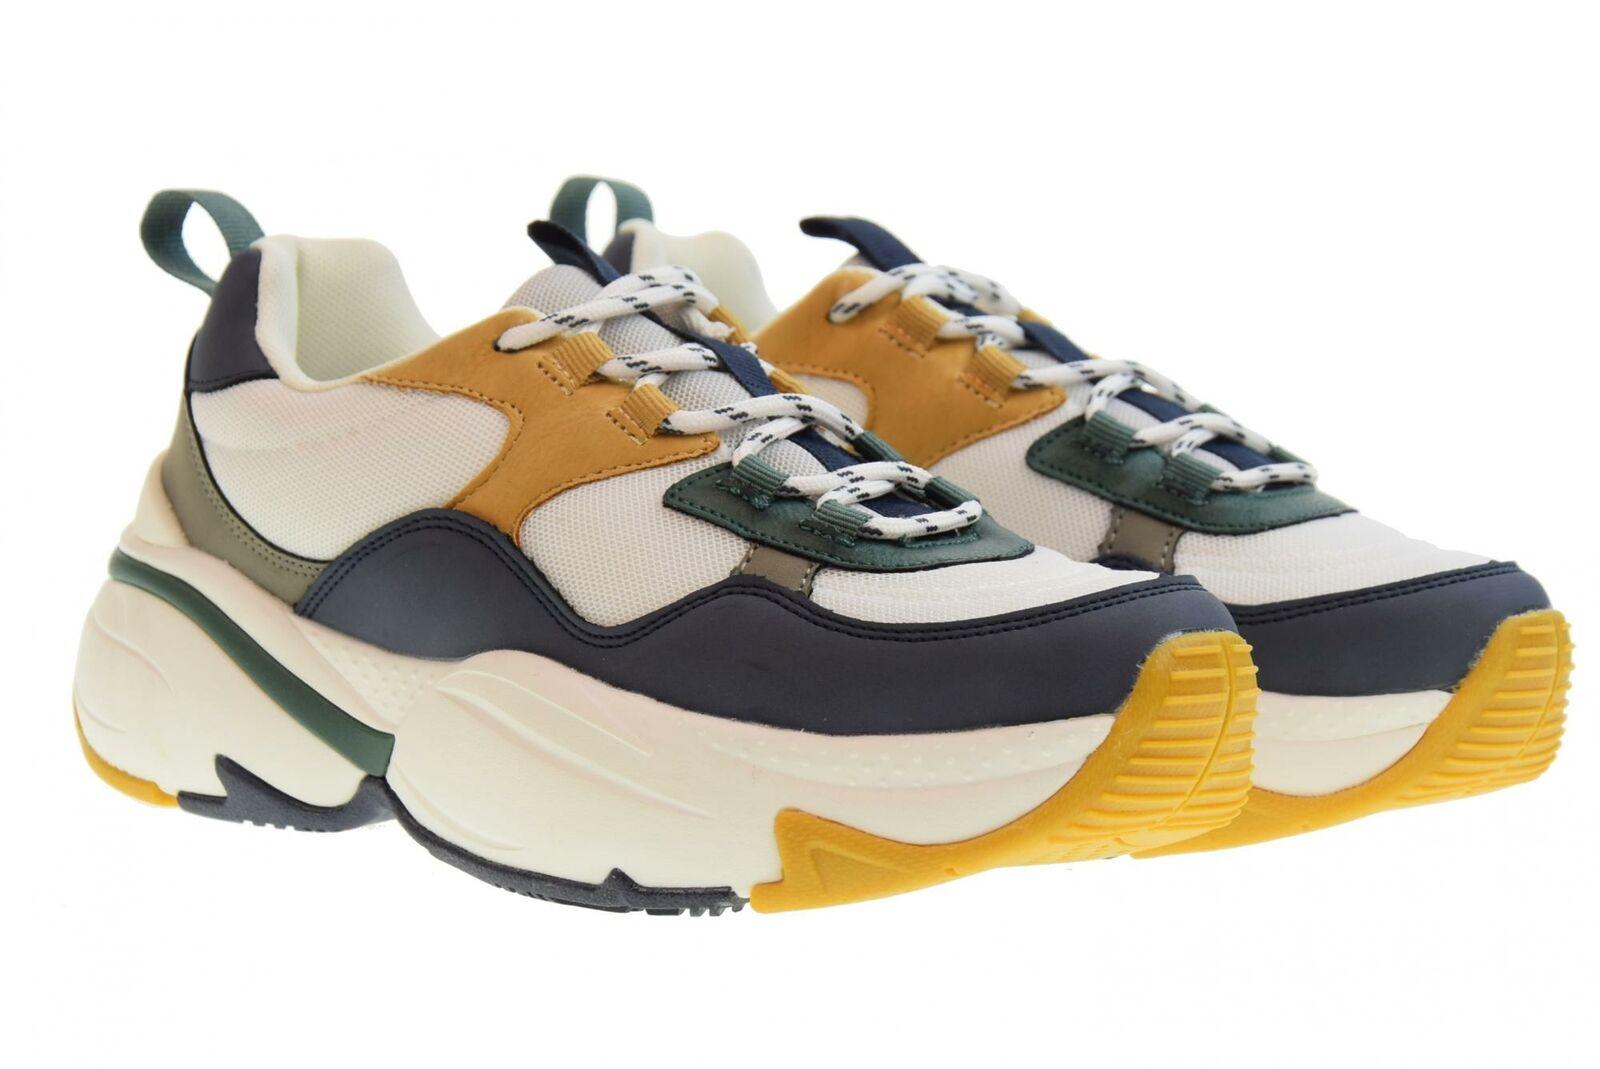 Victoria Victoria Victoria P19f shoes femme baskets 147102 blue 9fc514